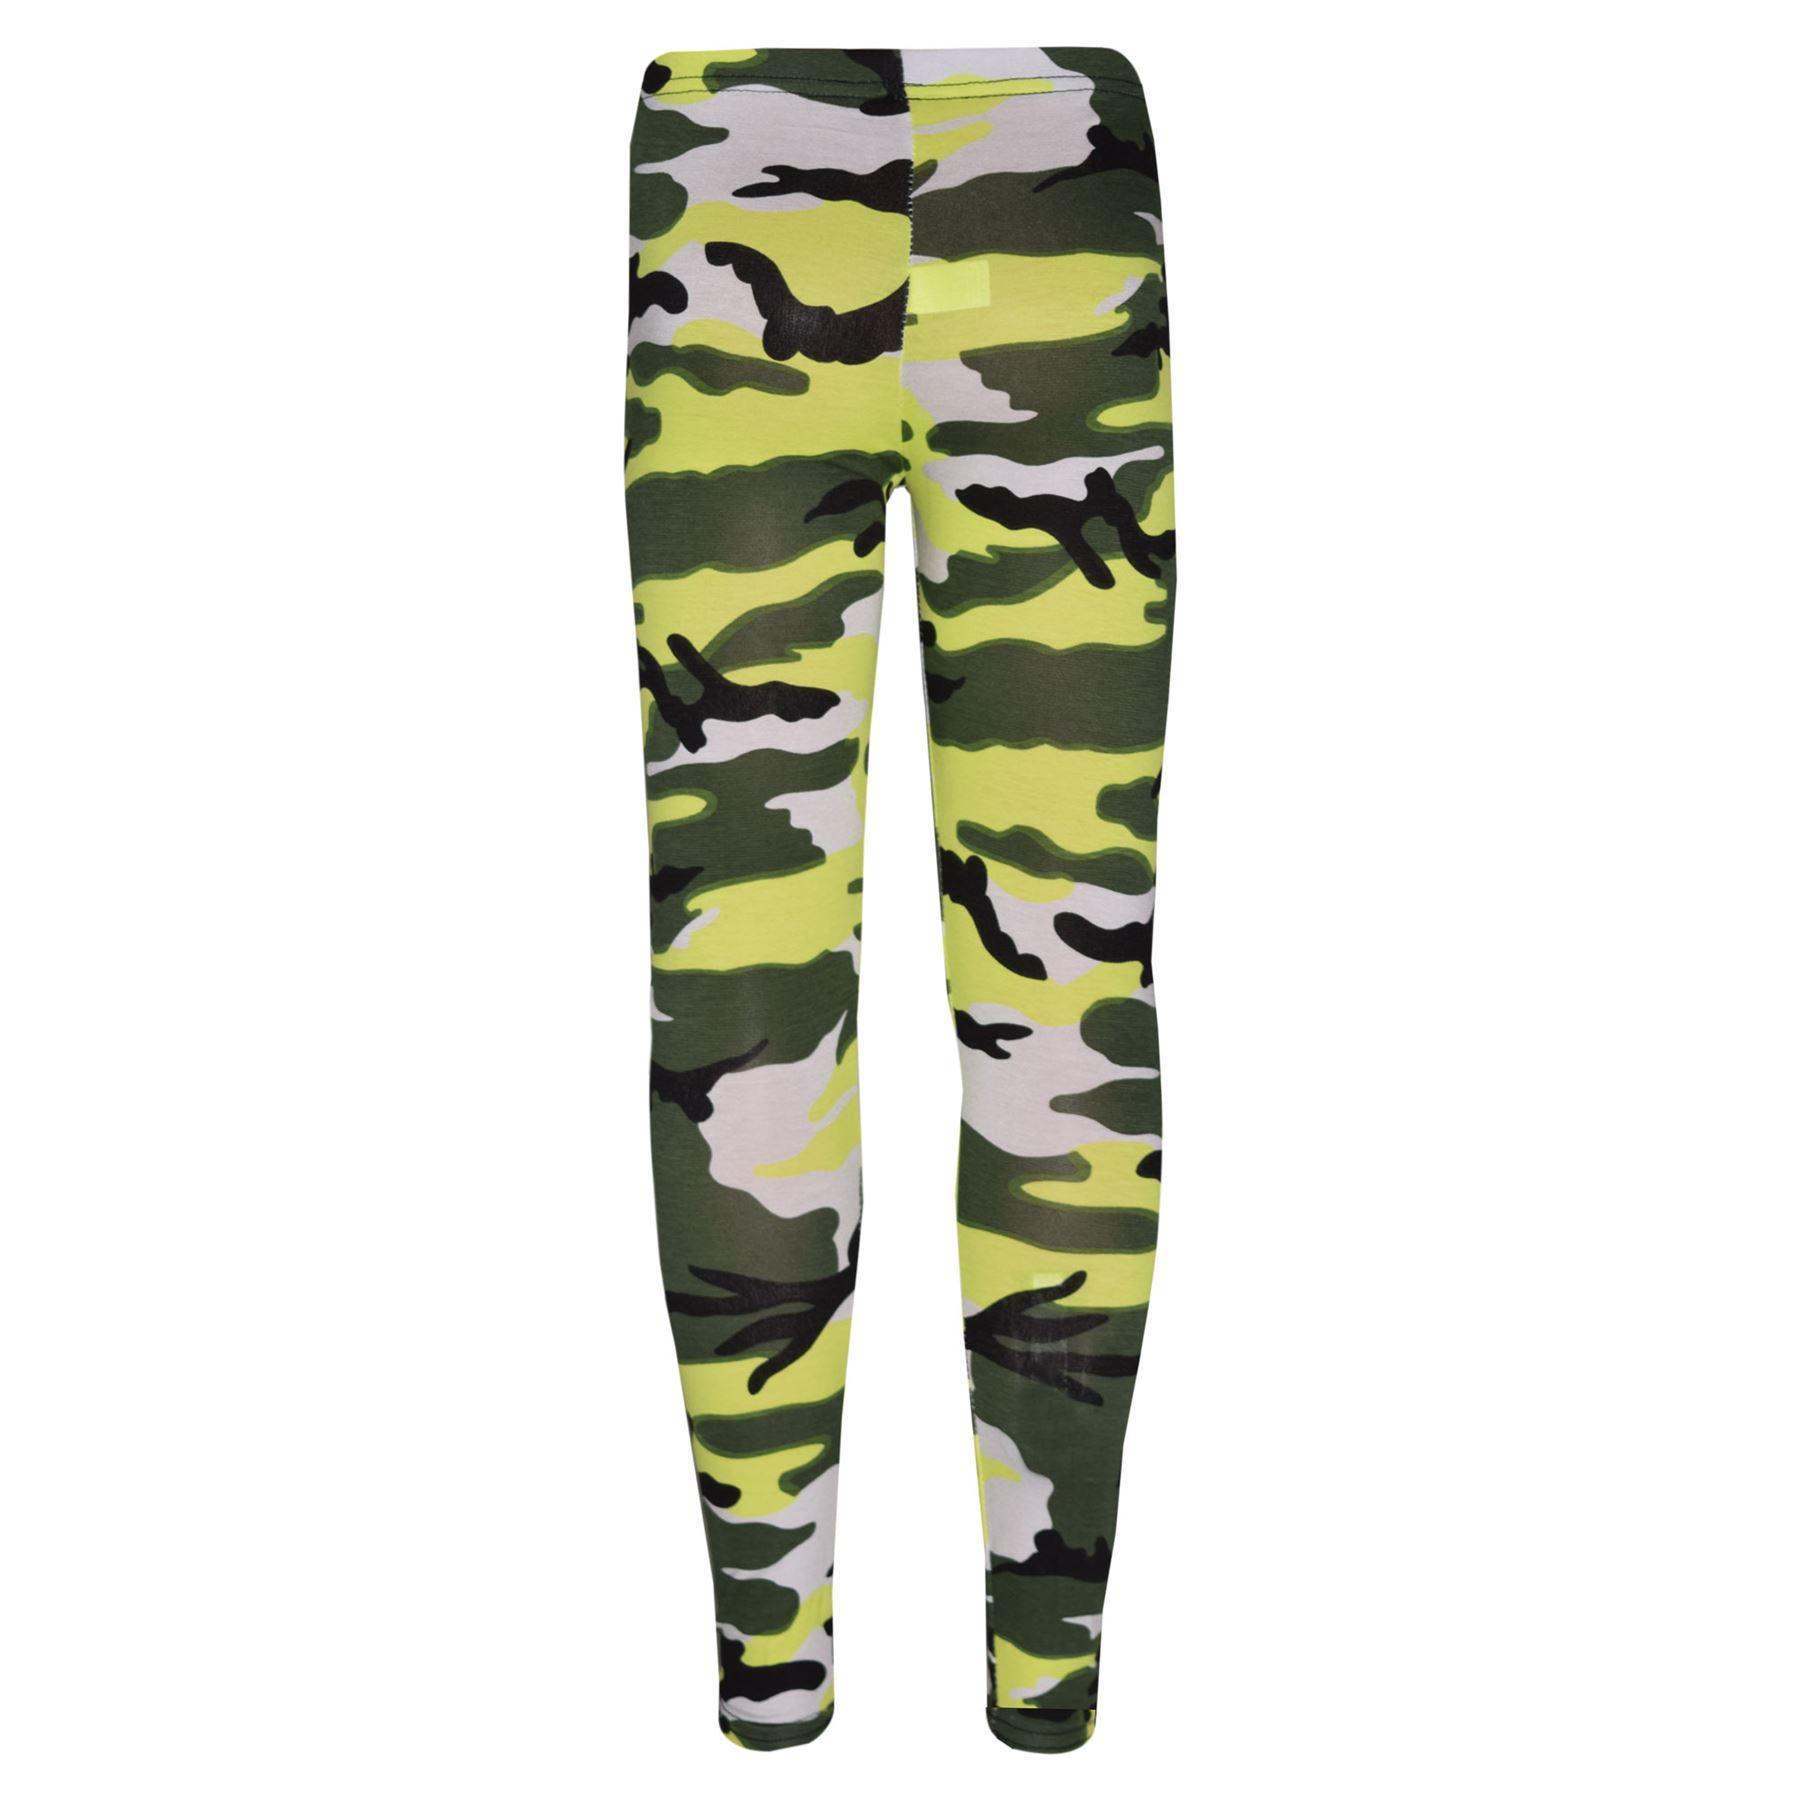 Girls-NEW-YORK-BROOKLYN-98-ATHLECTIC-Camouflage-Print-Top-amp-Legging-Set-7-13-Yr thumbnail 38